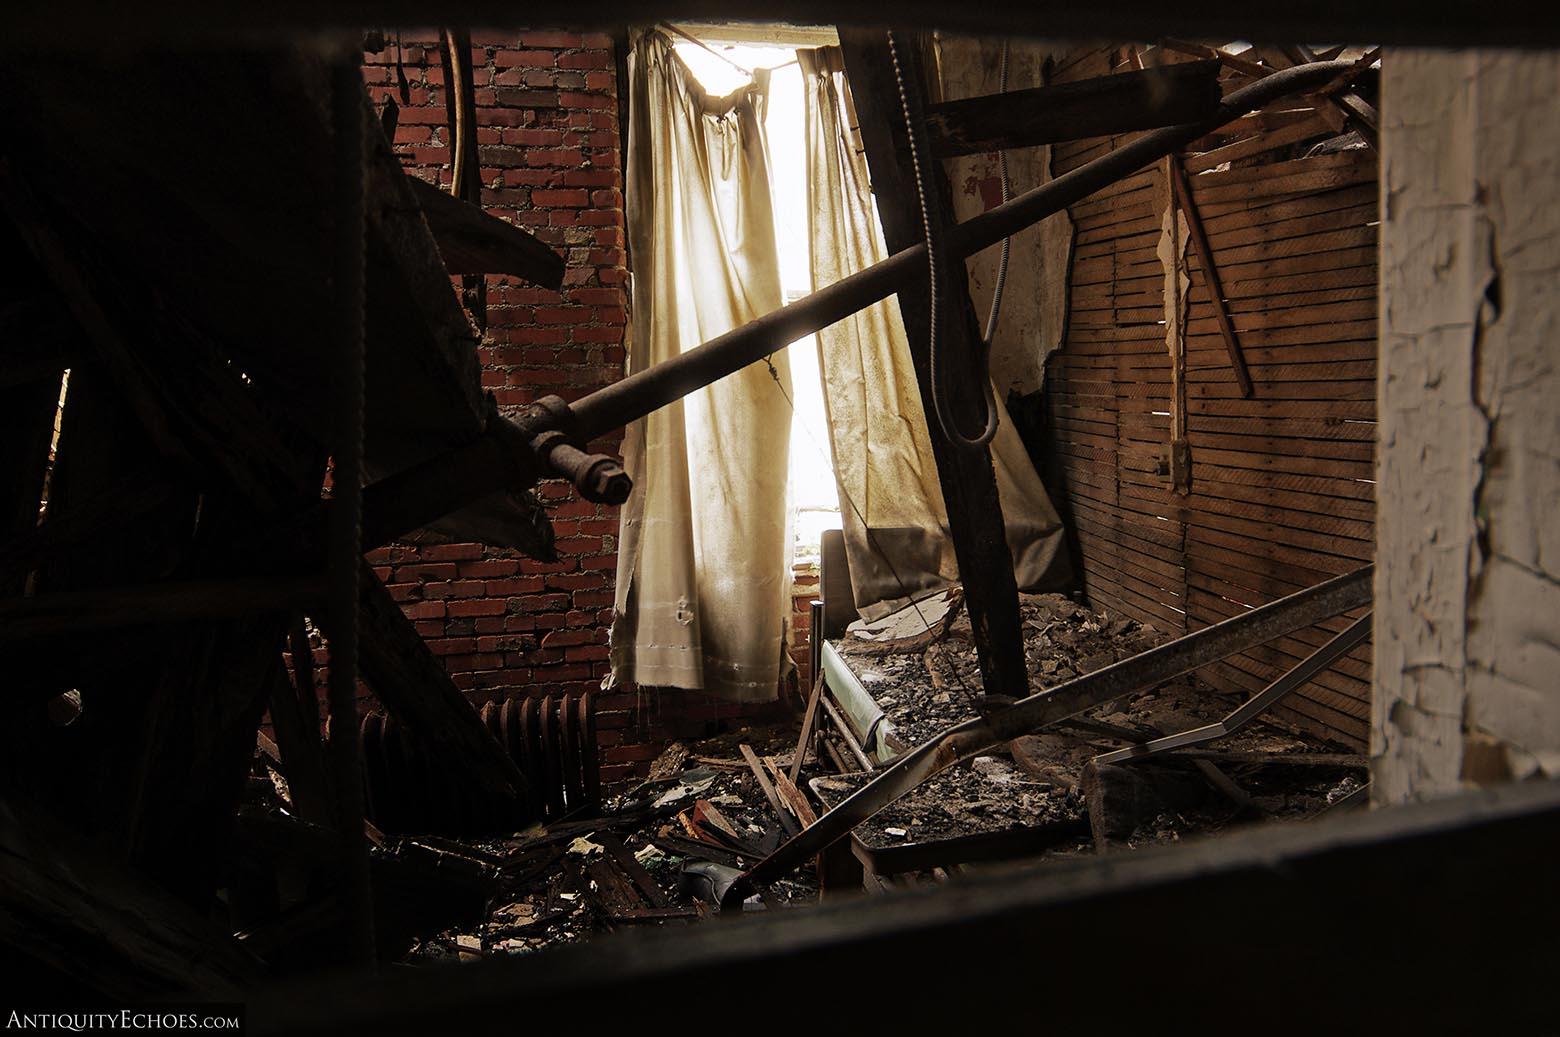 Brownsville General Hospital - Splintered